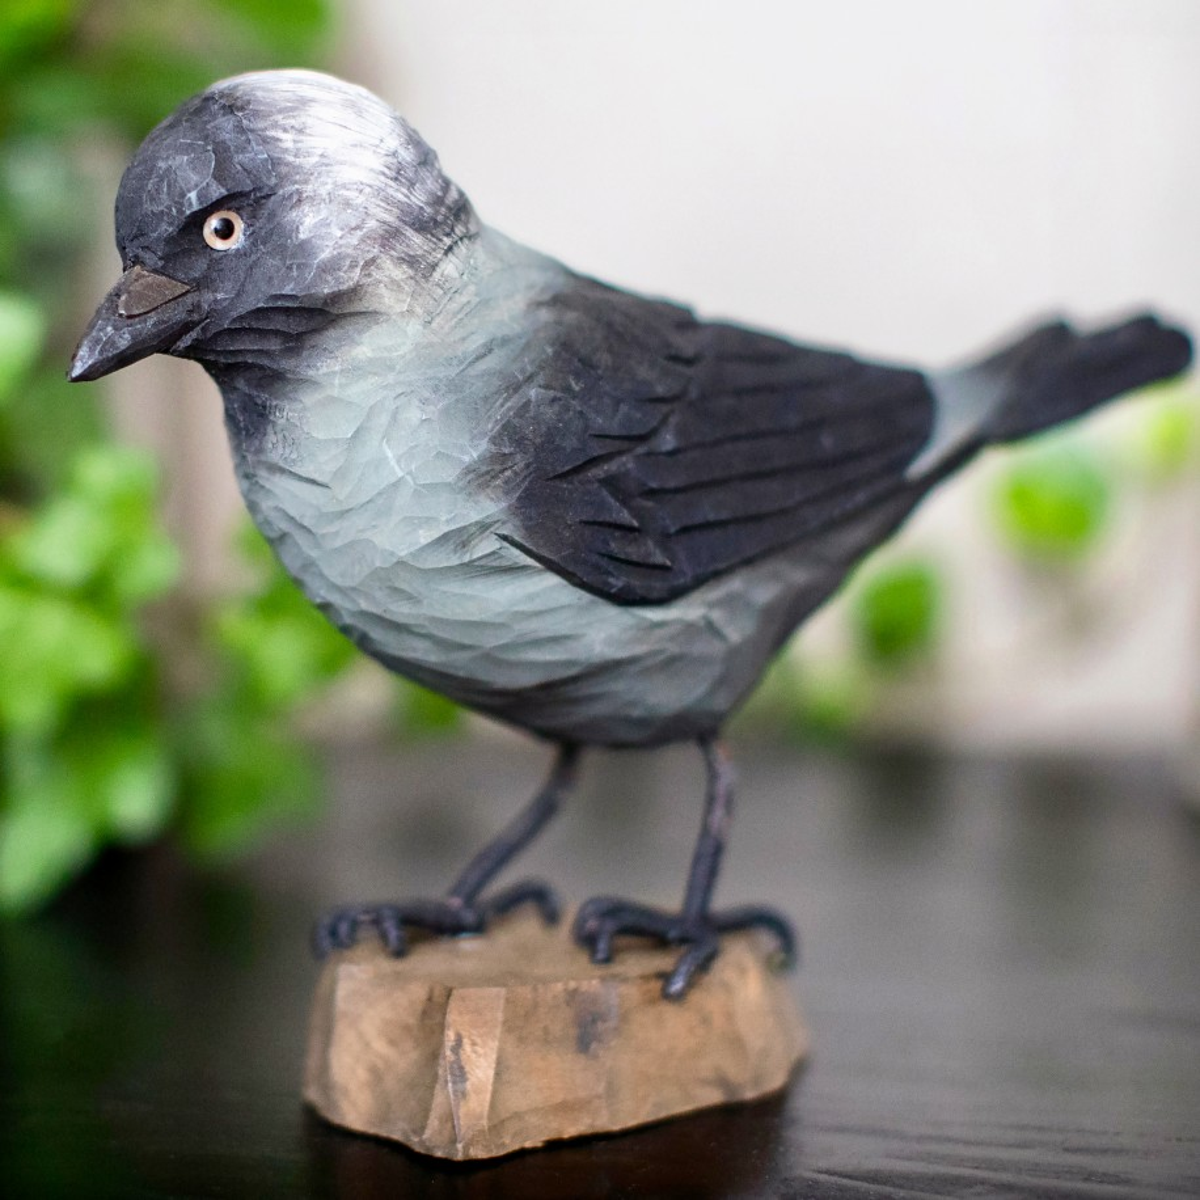 Wildlife Garden træfugl - allike